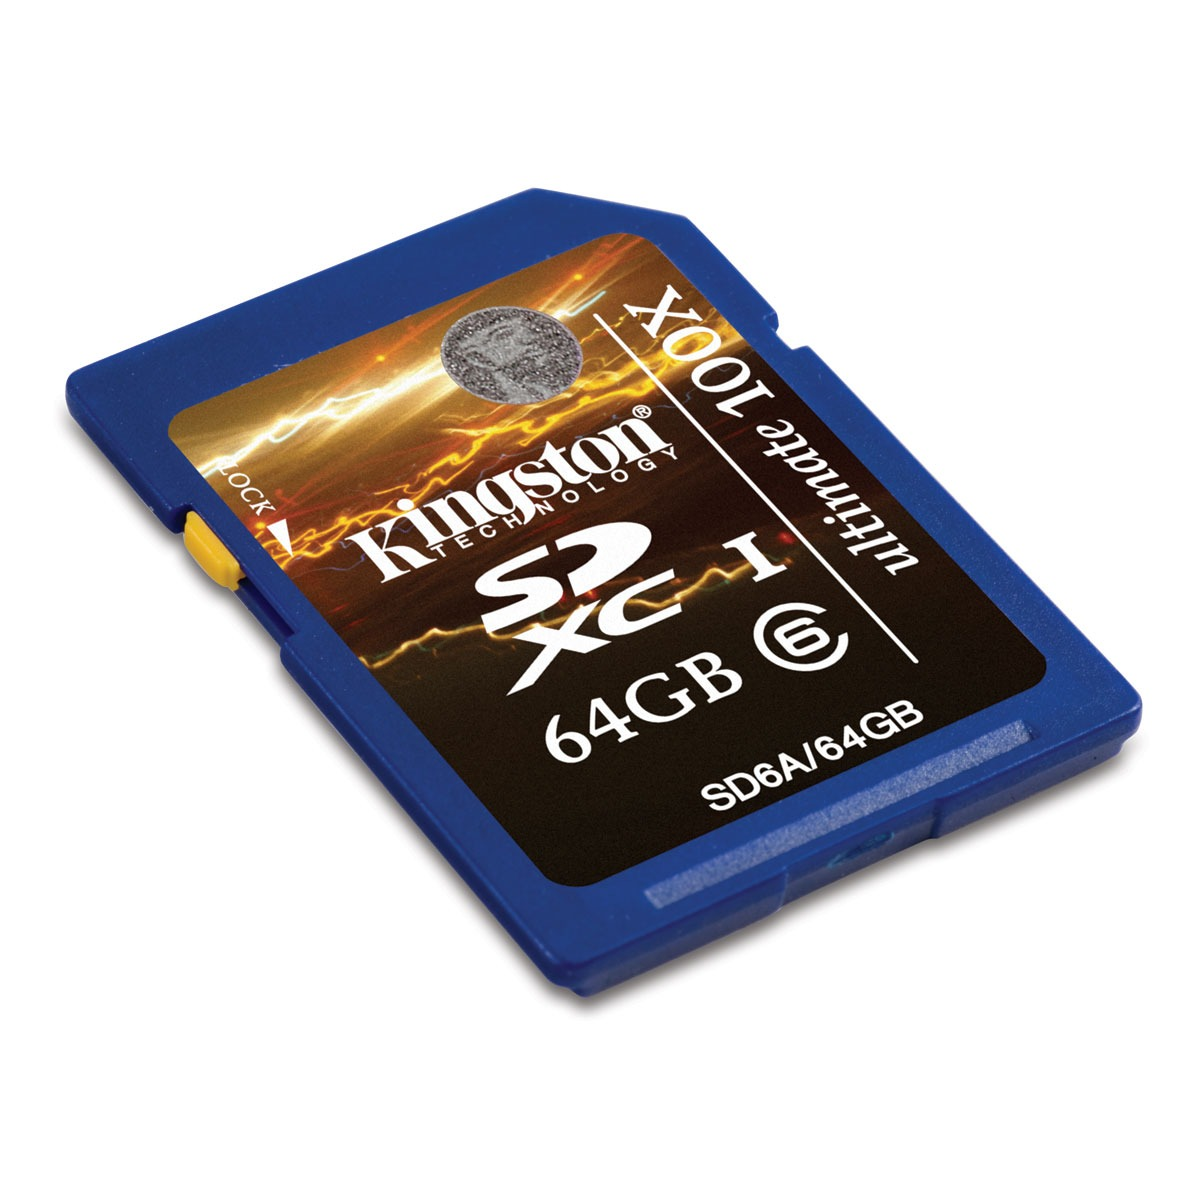 Carte mémoire Kingston SDXC Class 6 Ultimate 64 GB Kingston SDXC Ultimate 64 Go - Class 6 (garantie 10 ans par Kingston)